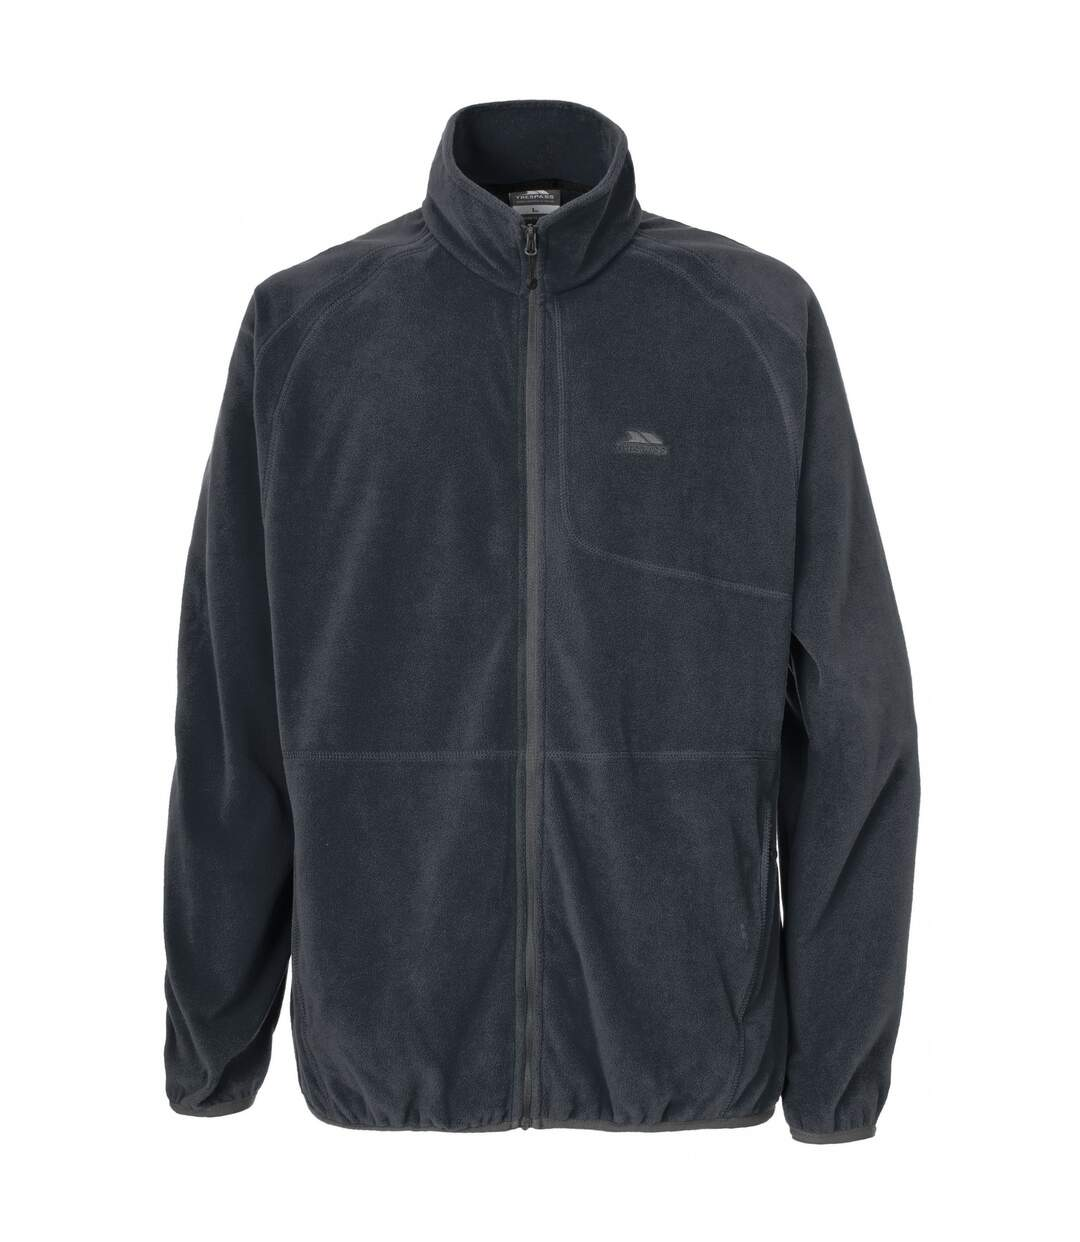 Trespass Mens Gladstone Full Zip Fleece Jacket (Flint) - UTTP260